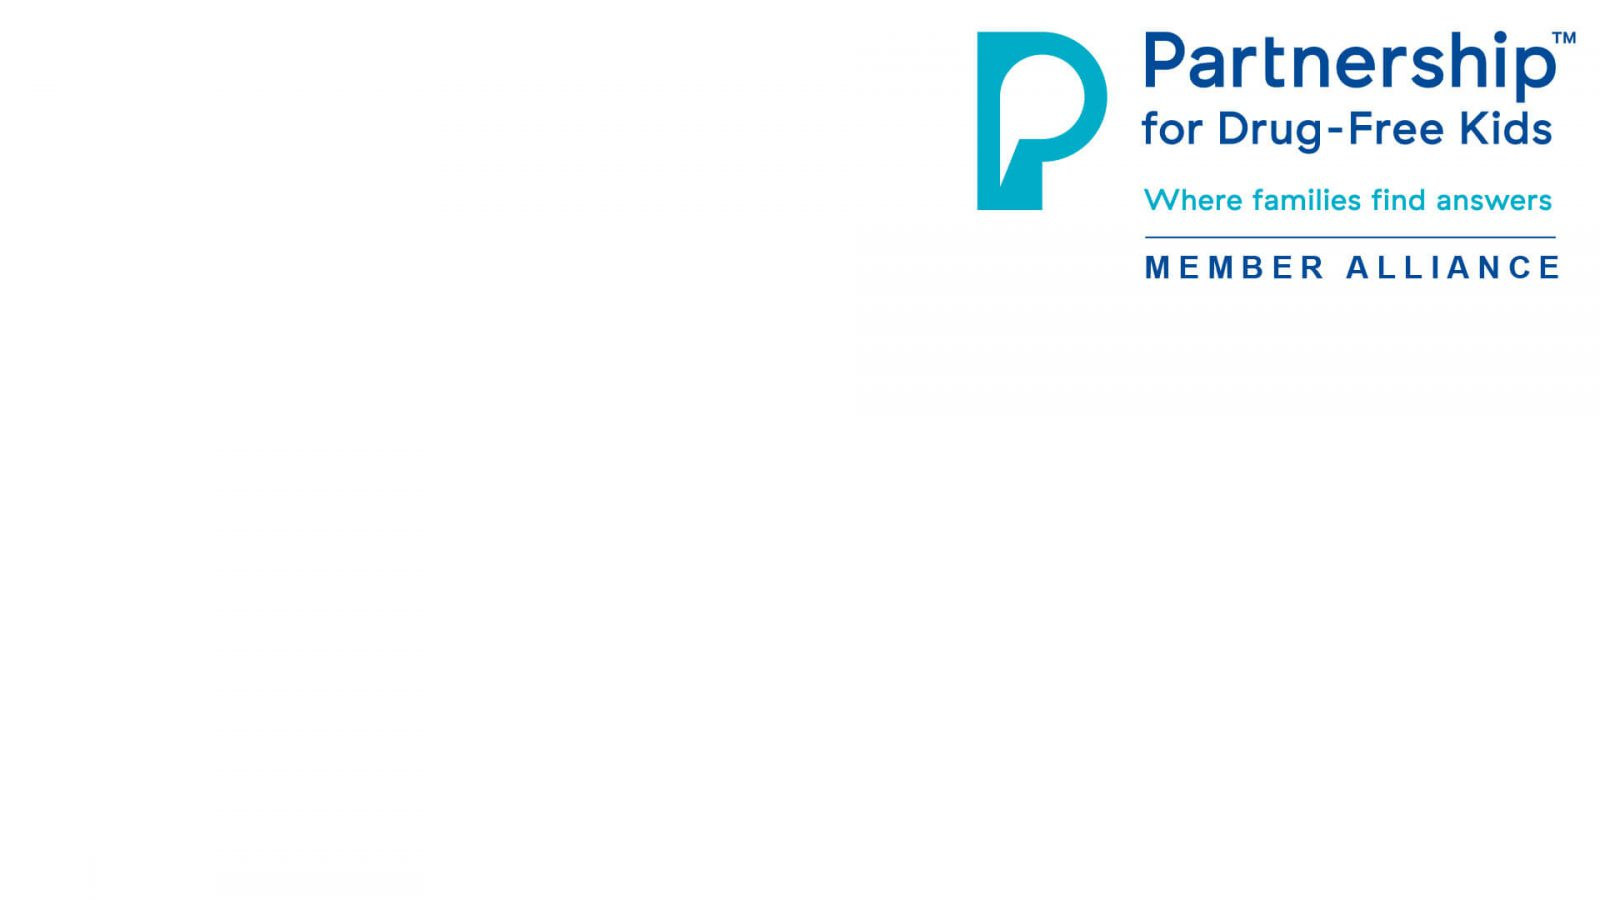 Partnership for Drug-Free Kids